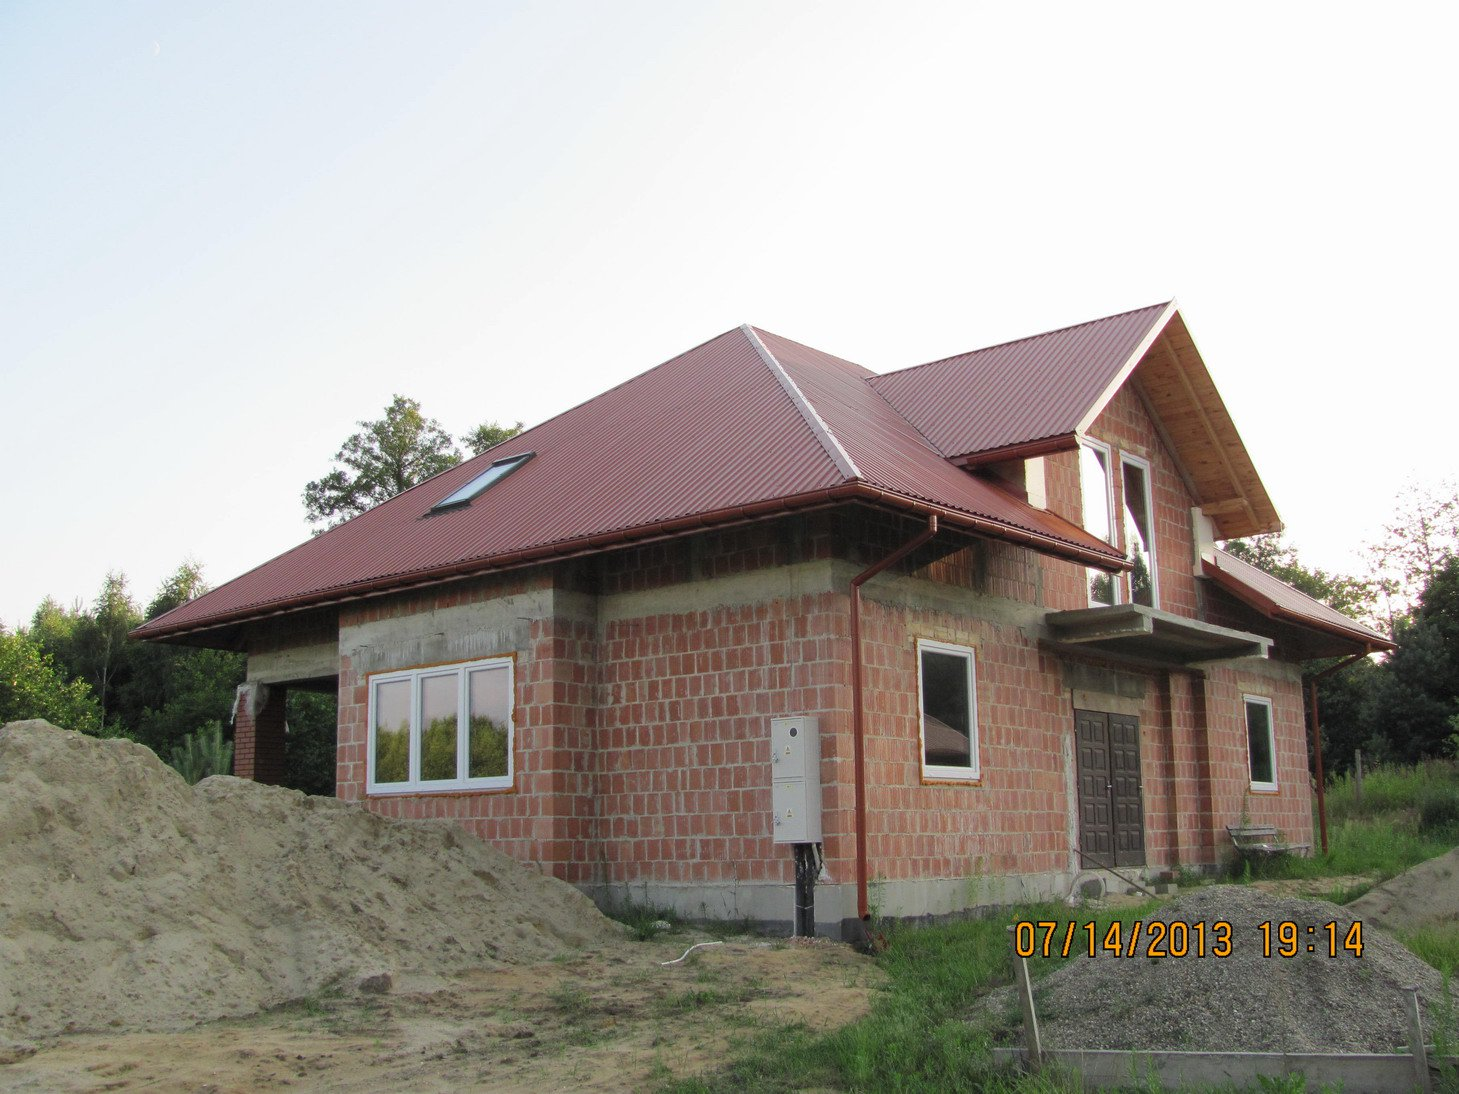 projekt-domu-filip-fot-7-1374839410-2ruqxkny.jpg